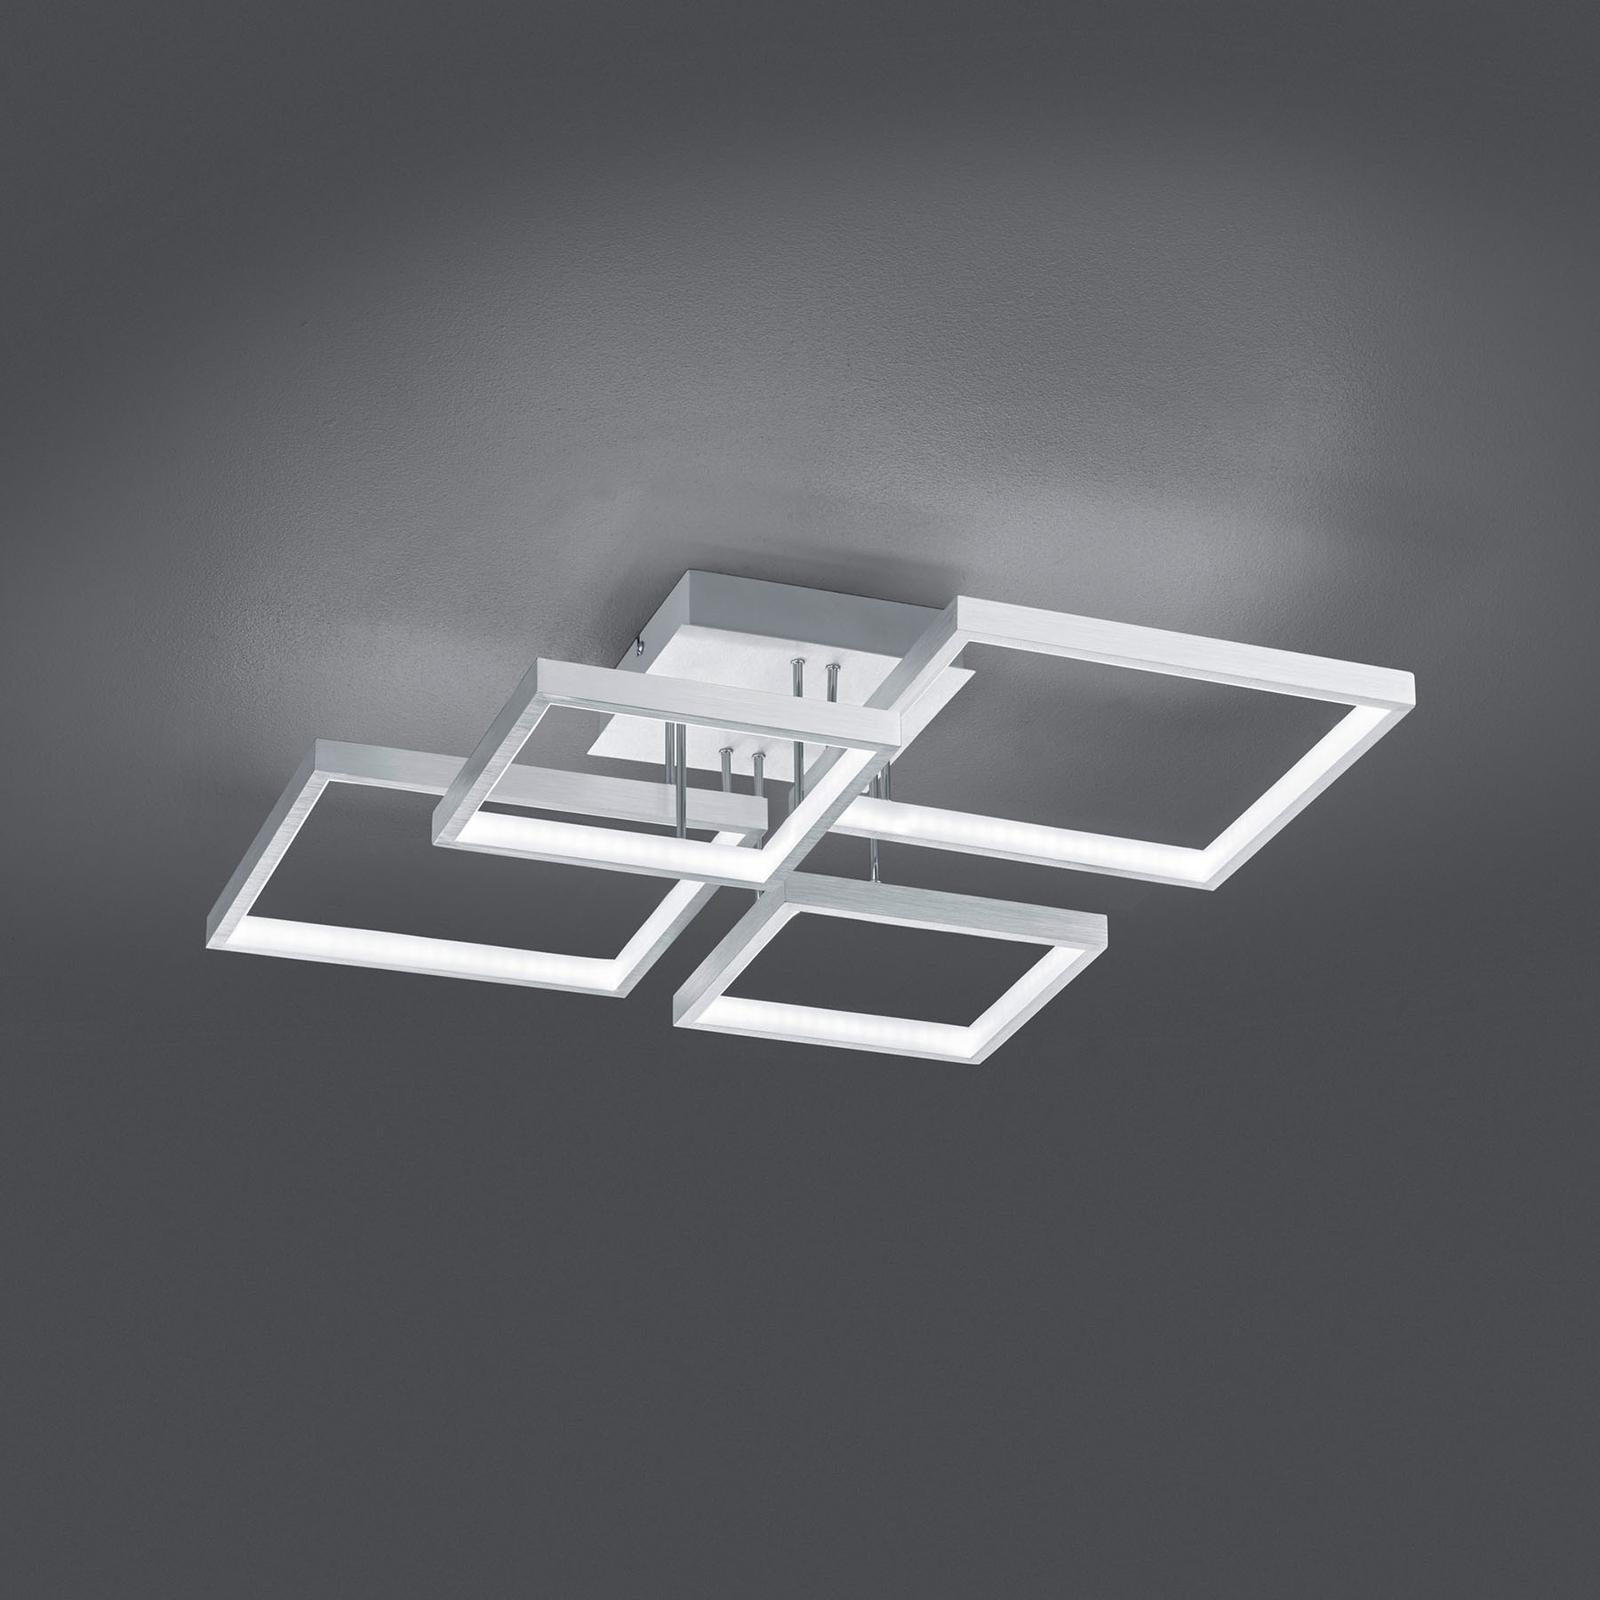 LED-kattovalo Sorrento 52x52cm, harjattu alumiini